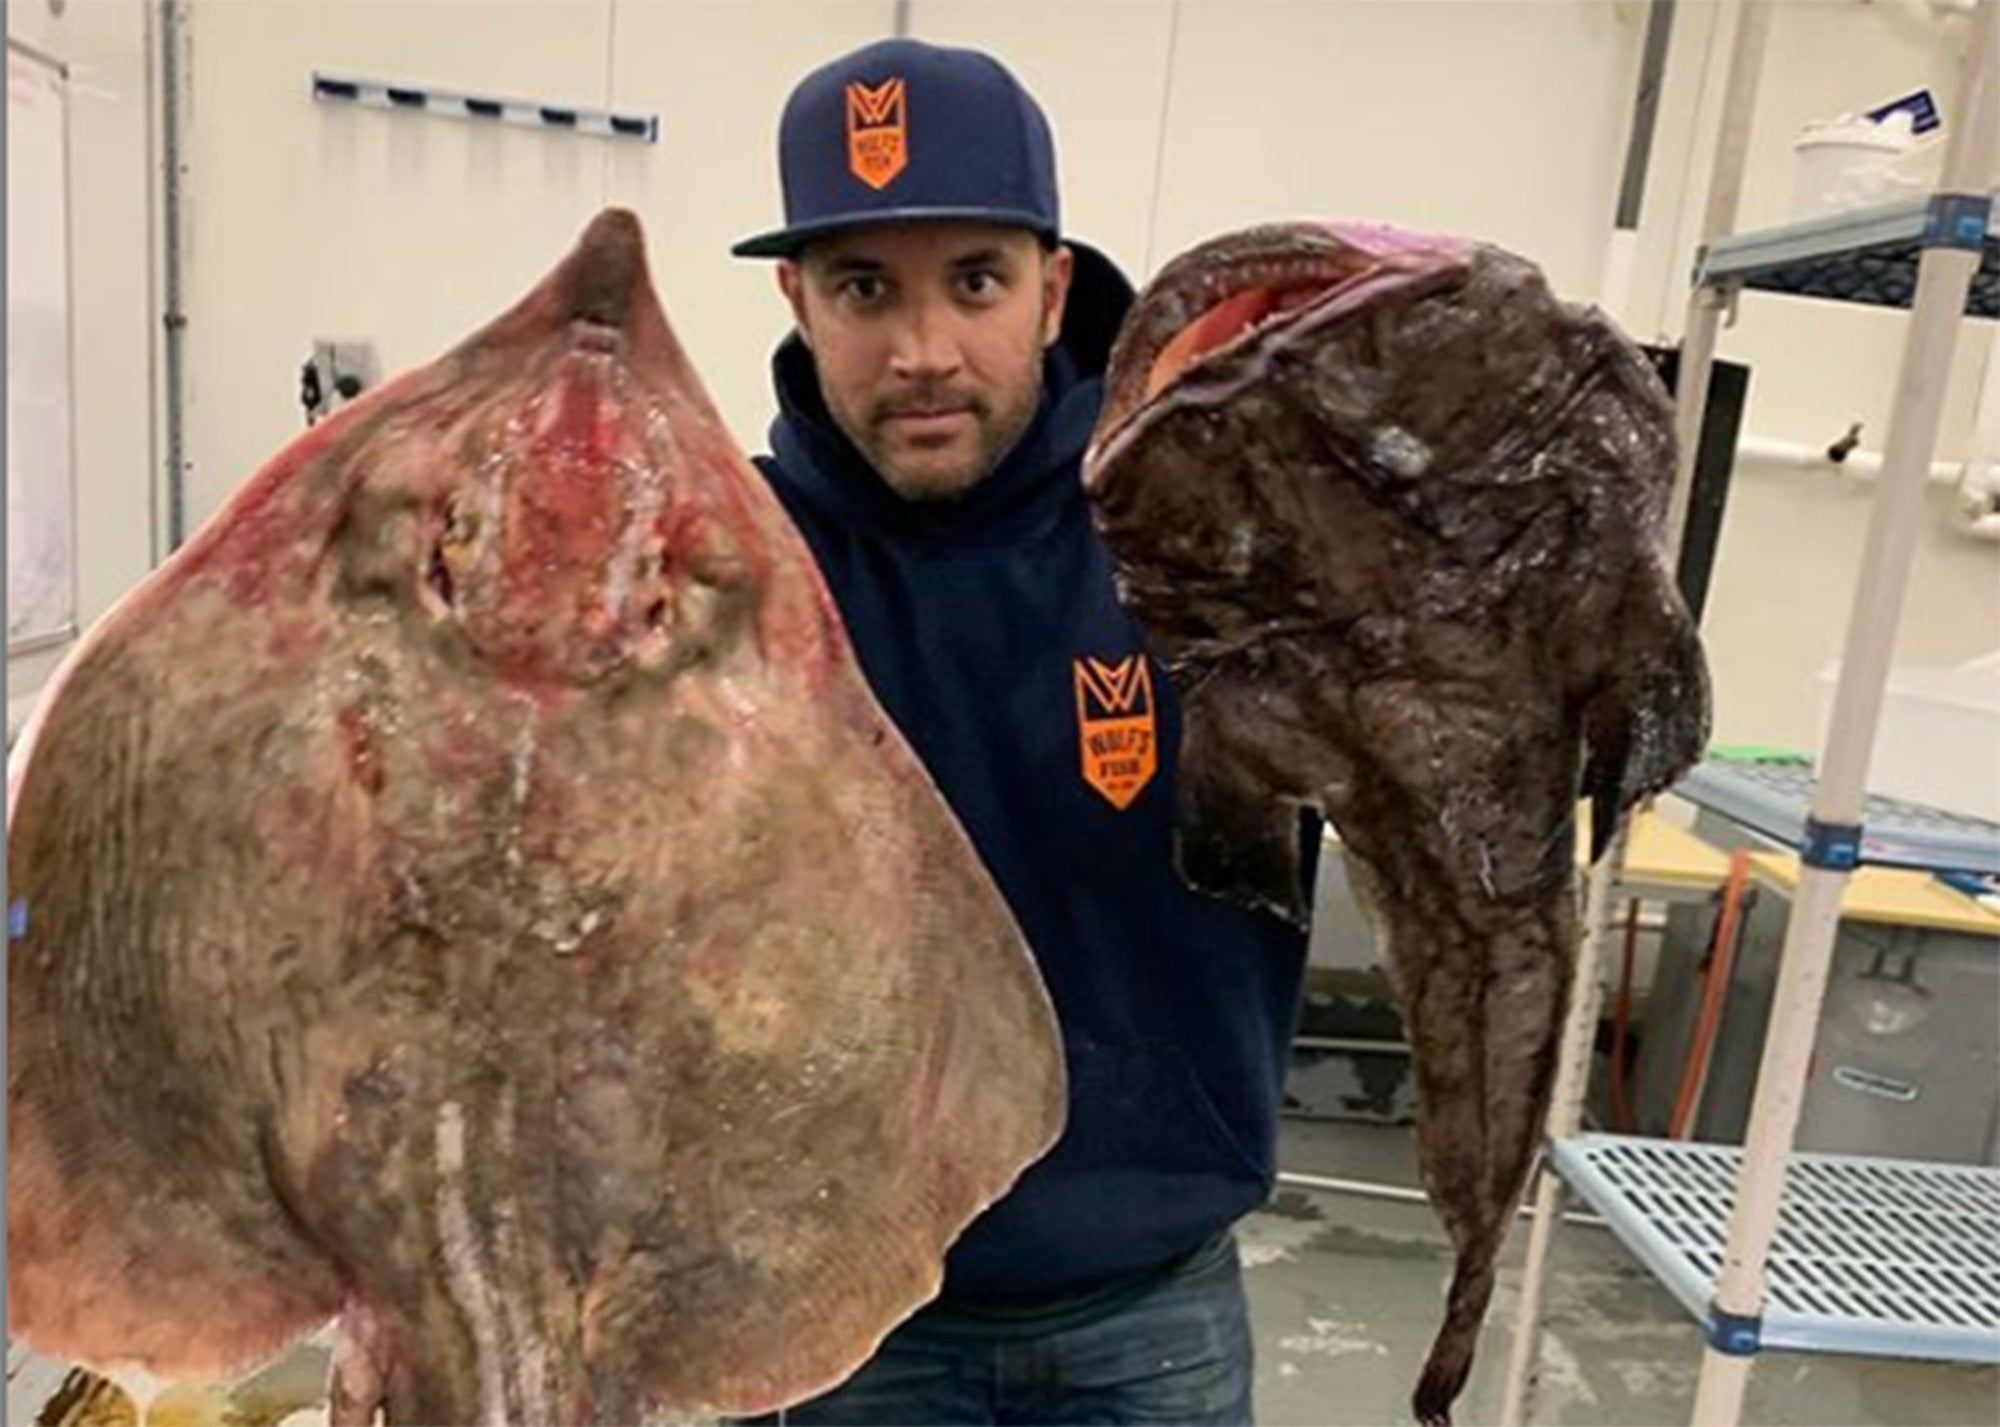 Bala Paiva, head fish cutter at Wulf's Fish